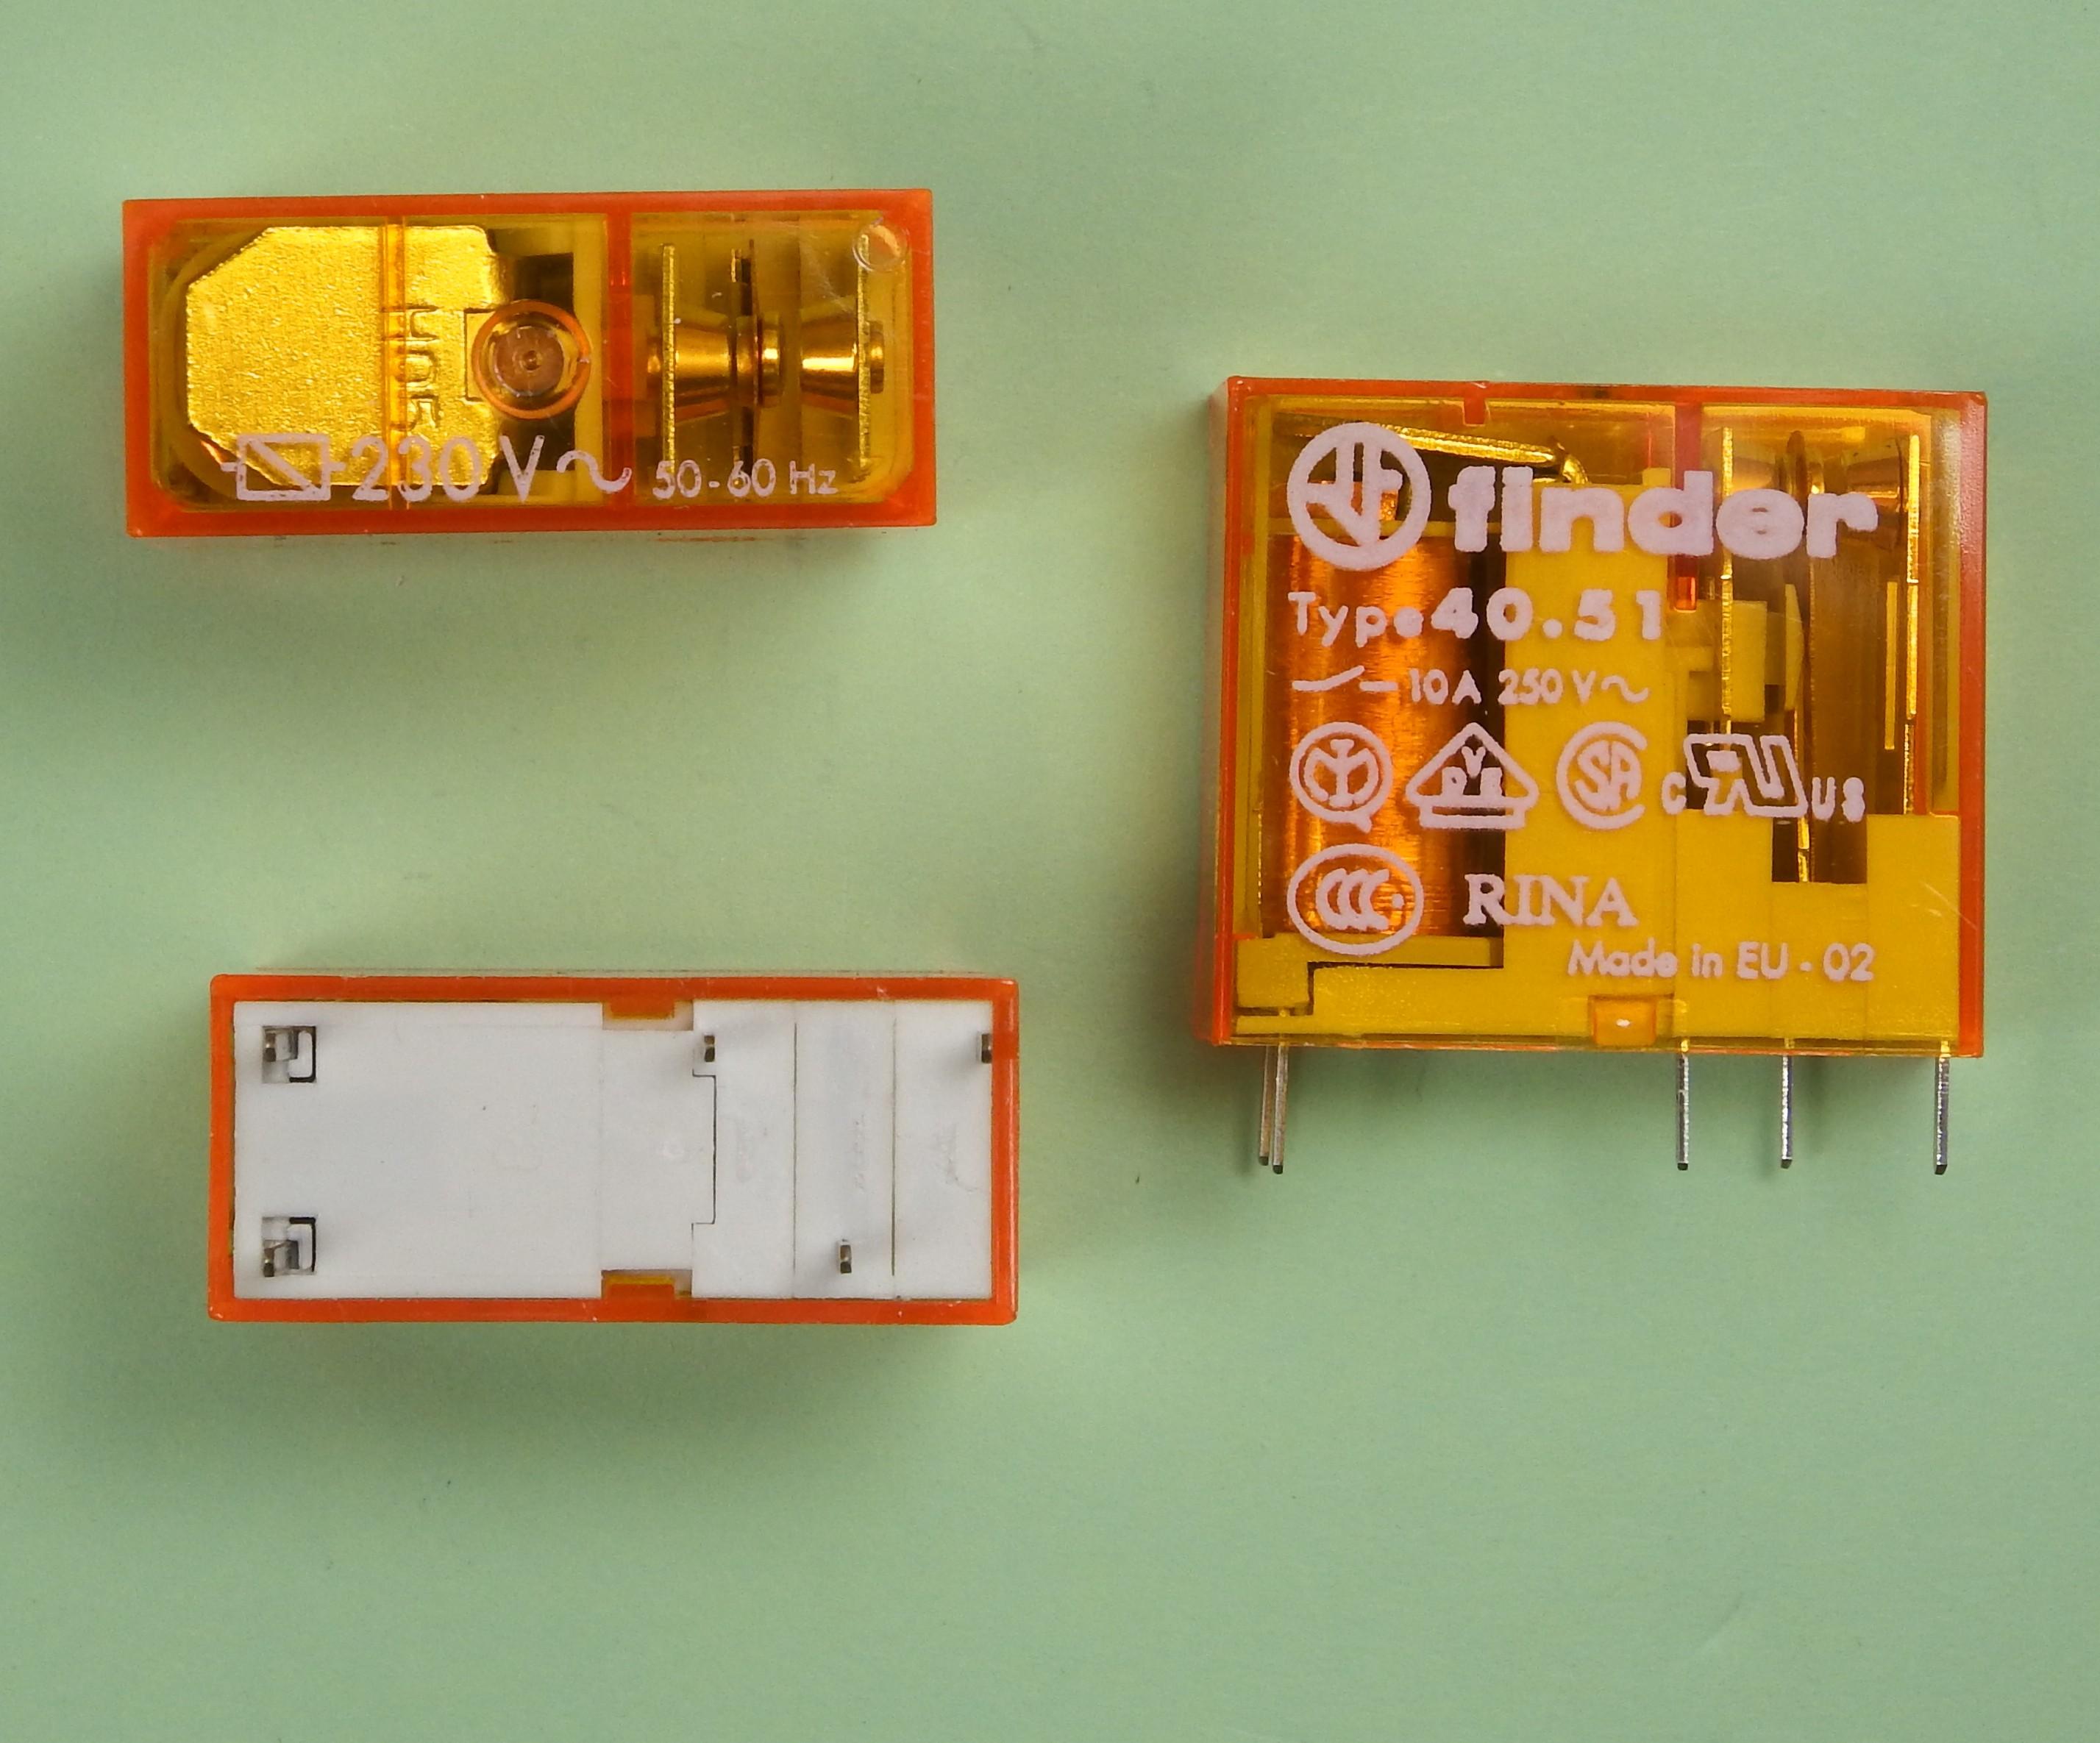 40.51.8.230.0000 Finder Steck-//Print Relais 1xUm  230V AC 10Ampere